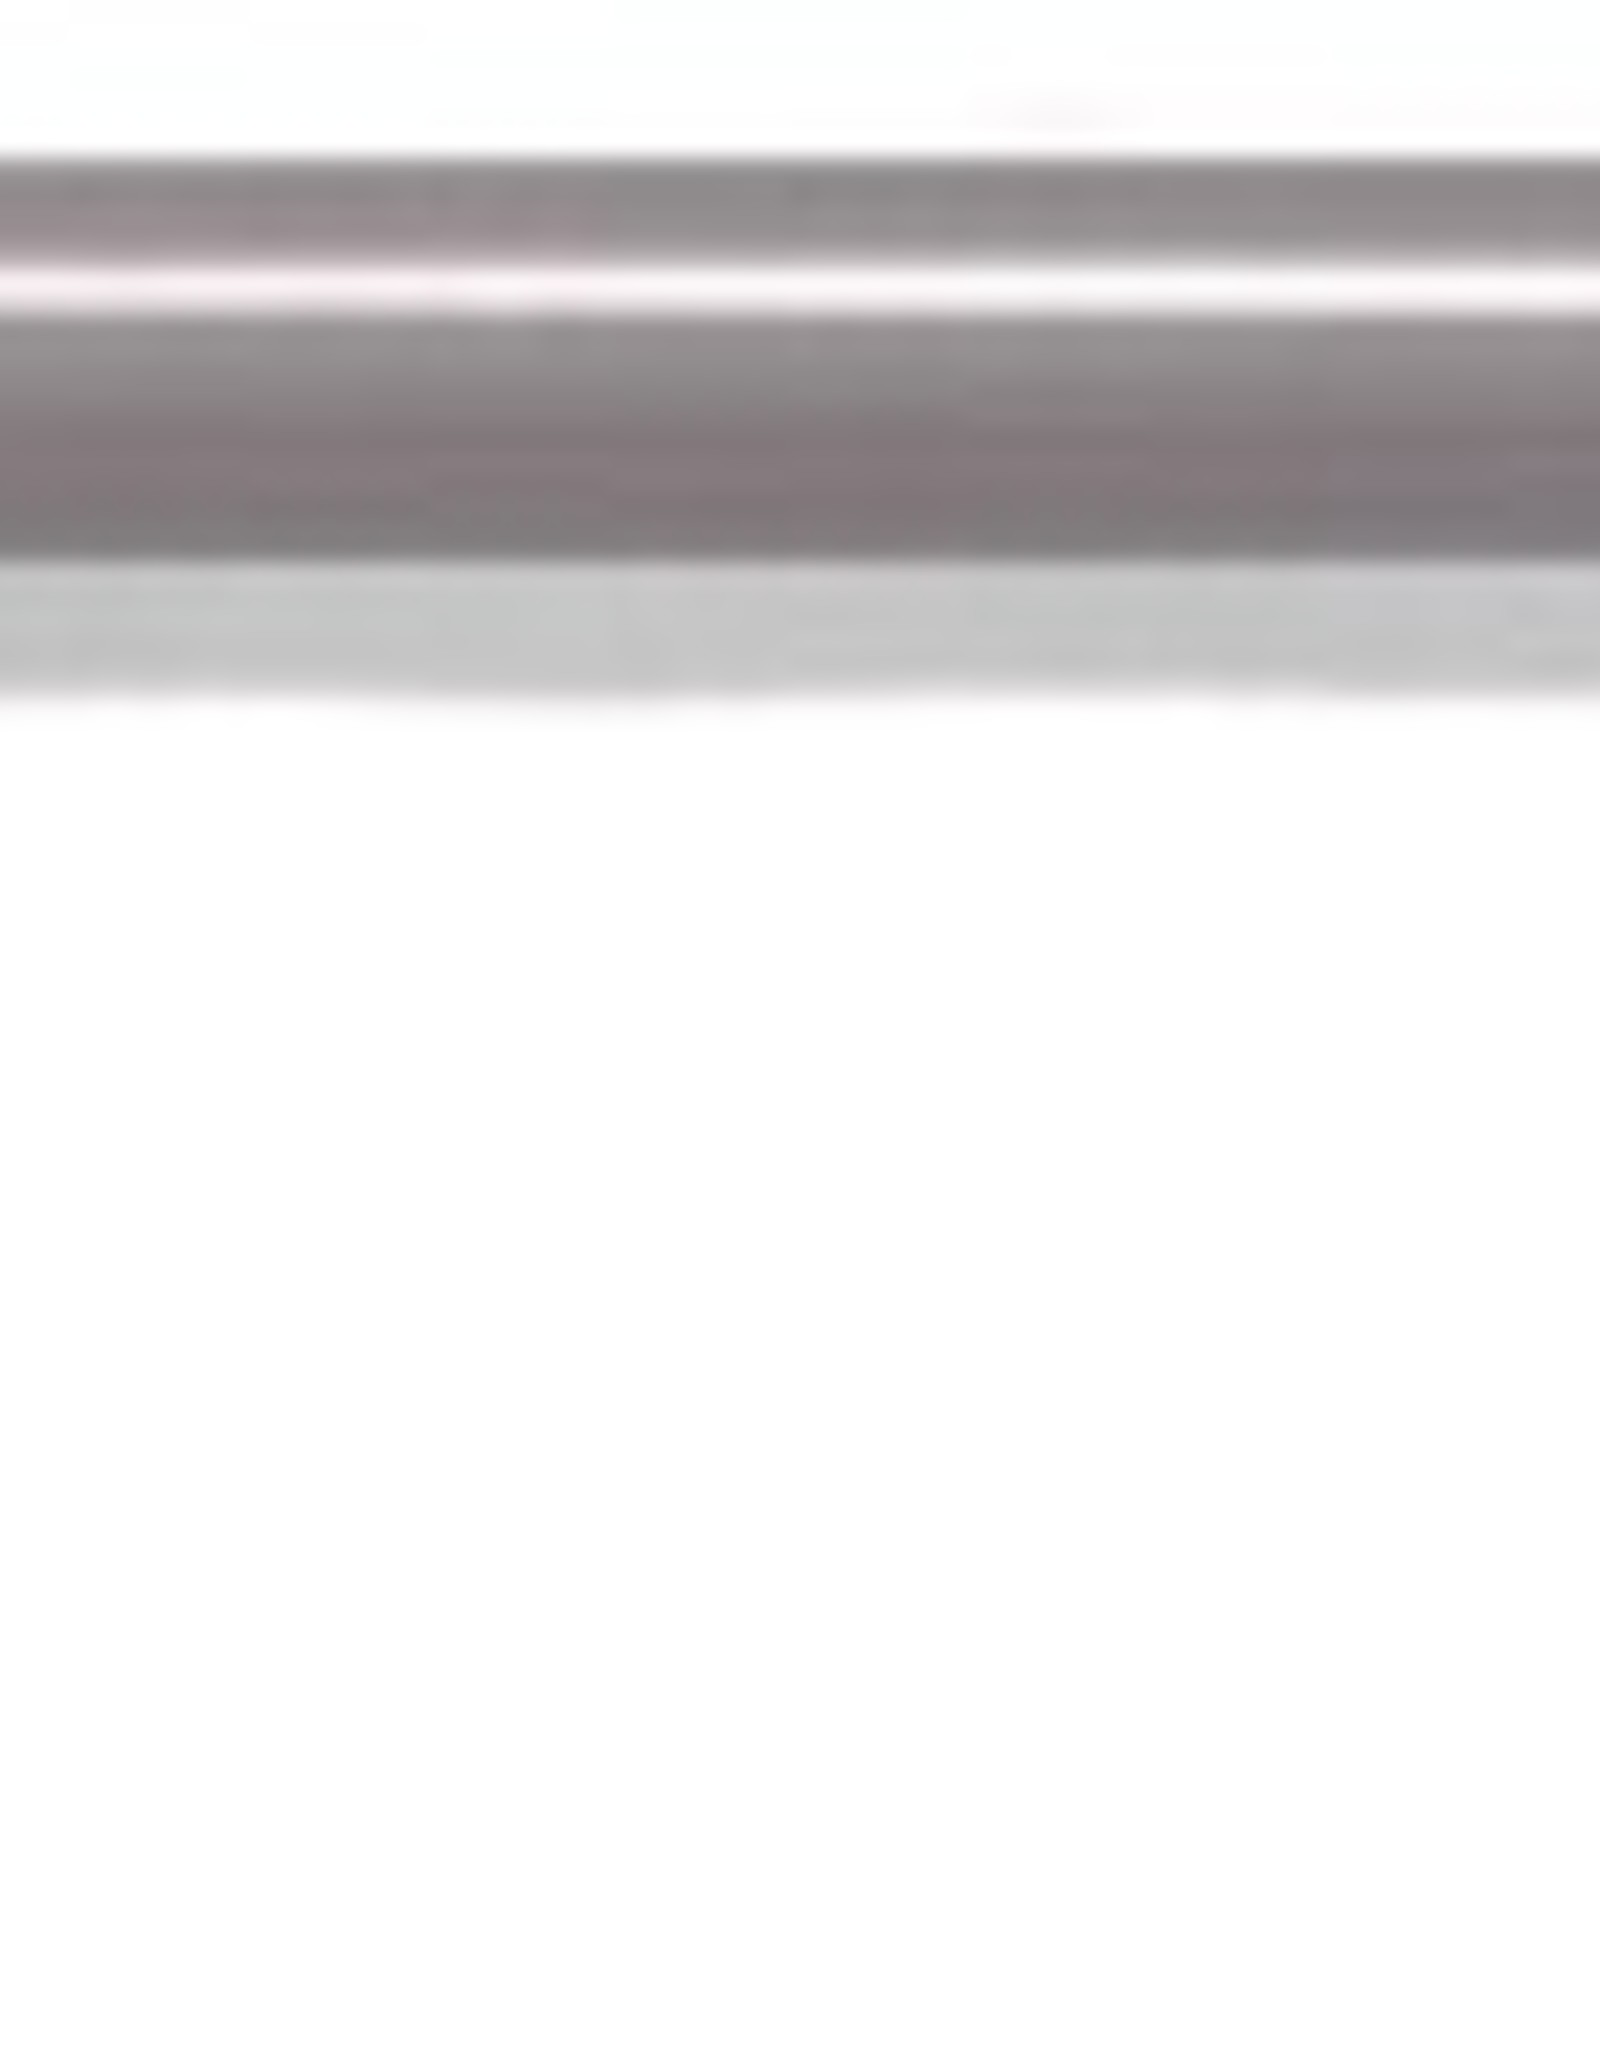 NUMATIC 1-delige aluminium Buis + Luchtregelaar